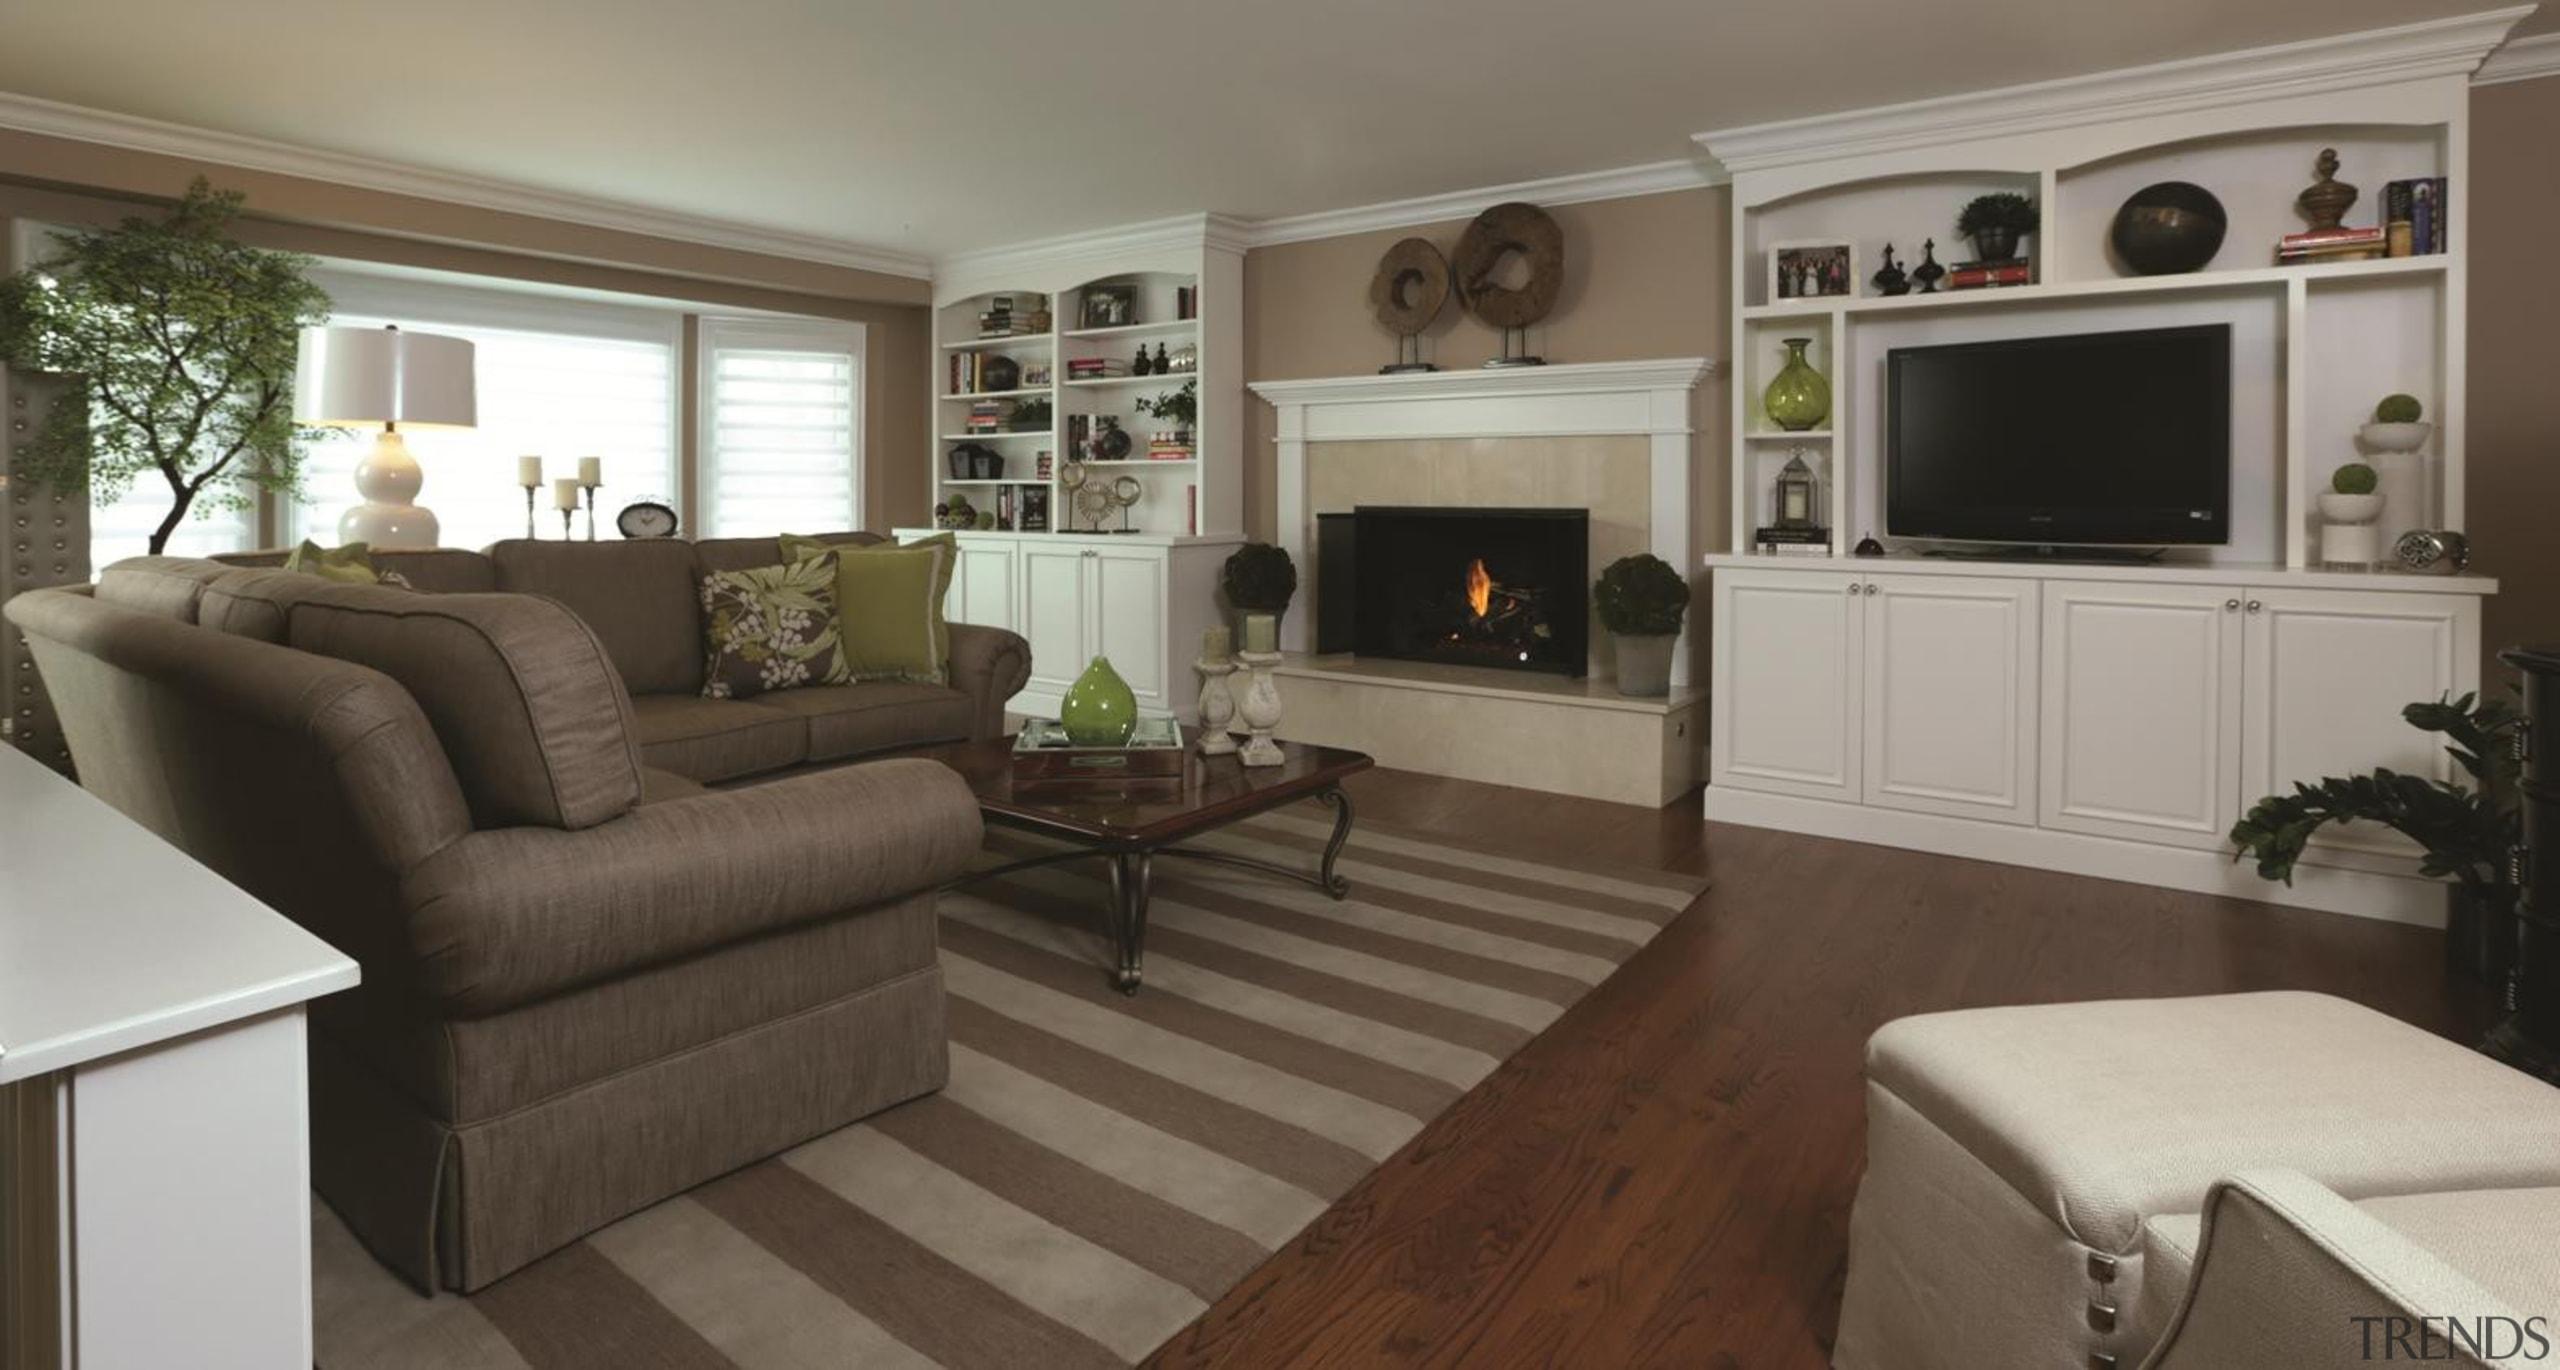 First Floor Remodel - Family Room - floor floor, flooring, home, interior design, living room, property, real estate, room, gray, brown